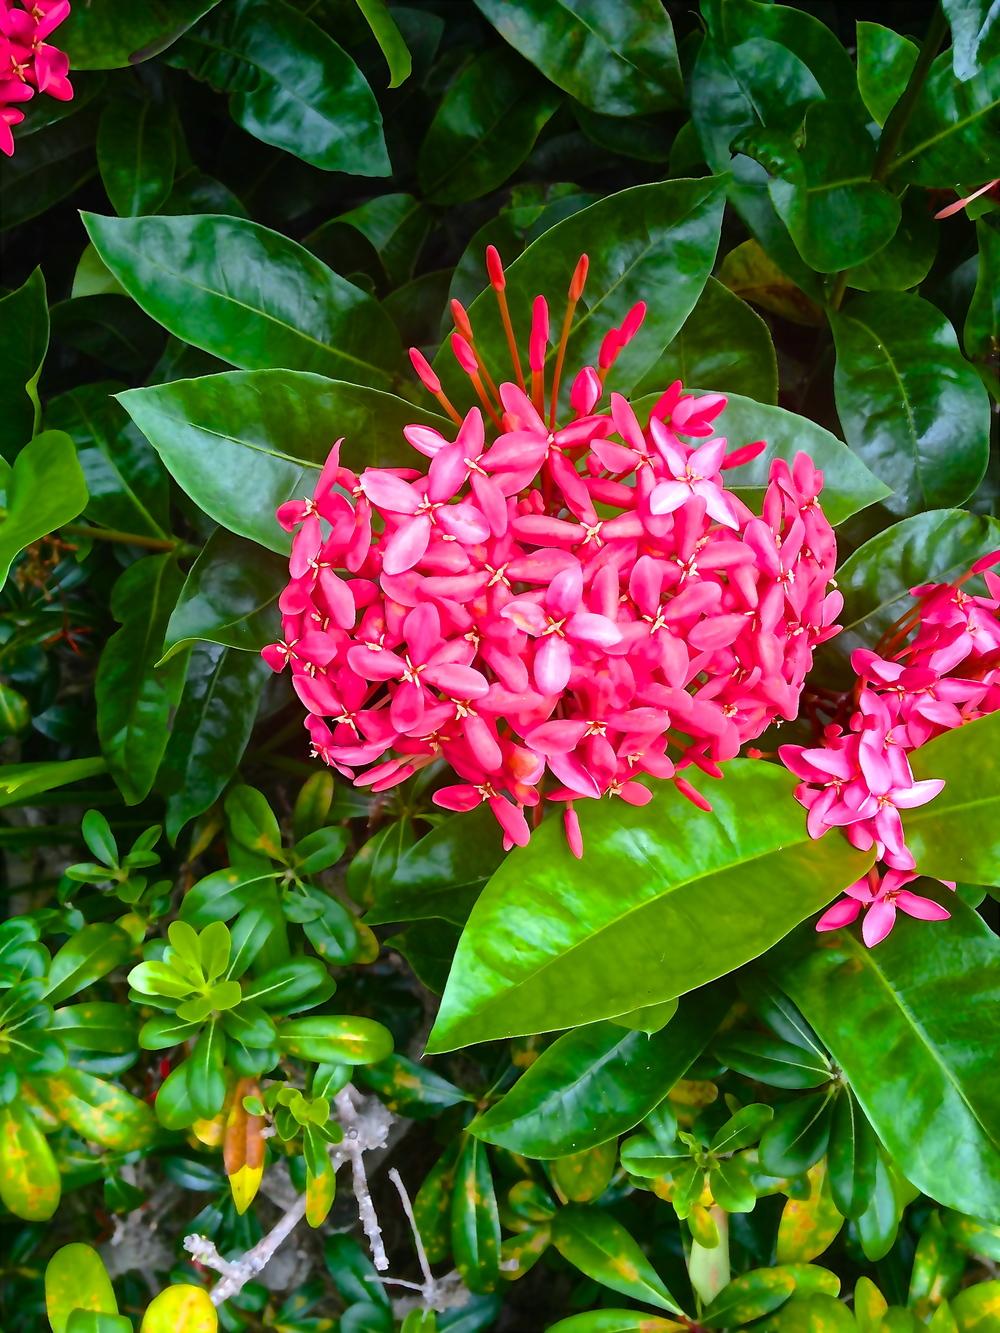 Native Blooms of The Tropics.Ohau, Maui, 2014.